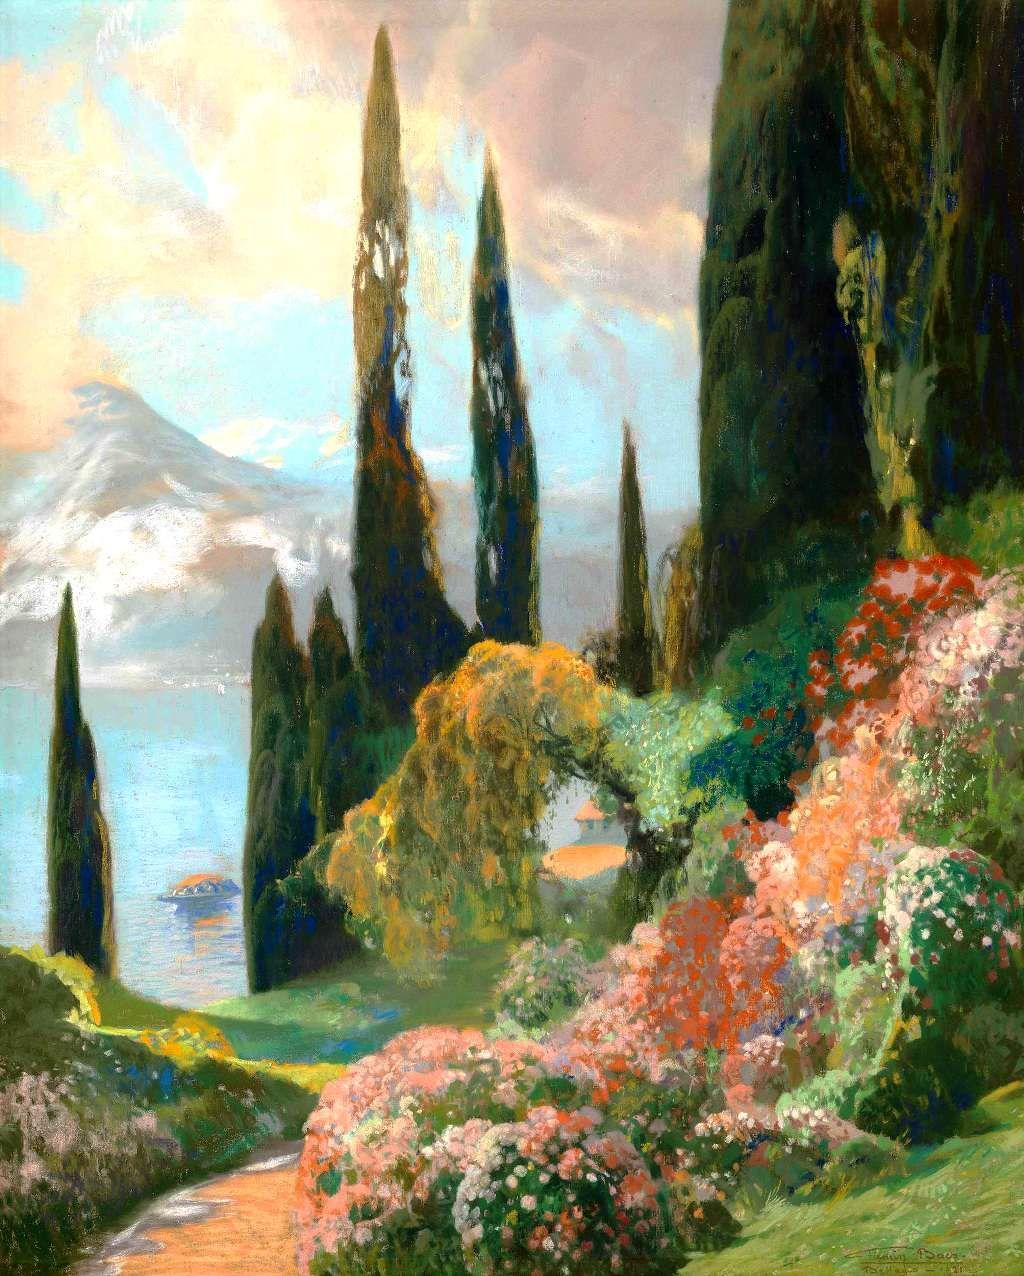 Catonhottinroof Firmin Baes 1874 1943 Bellagio In 2019